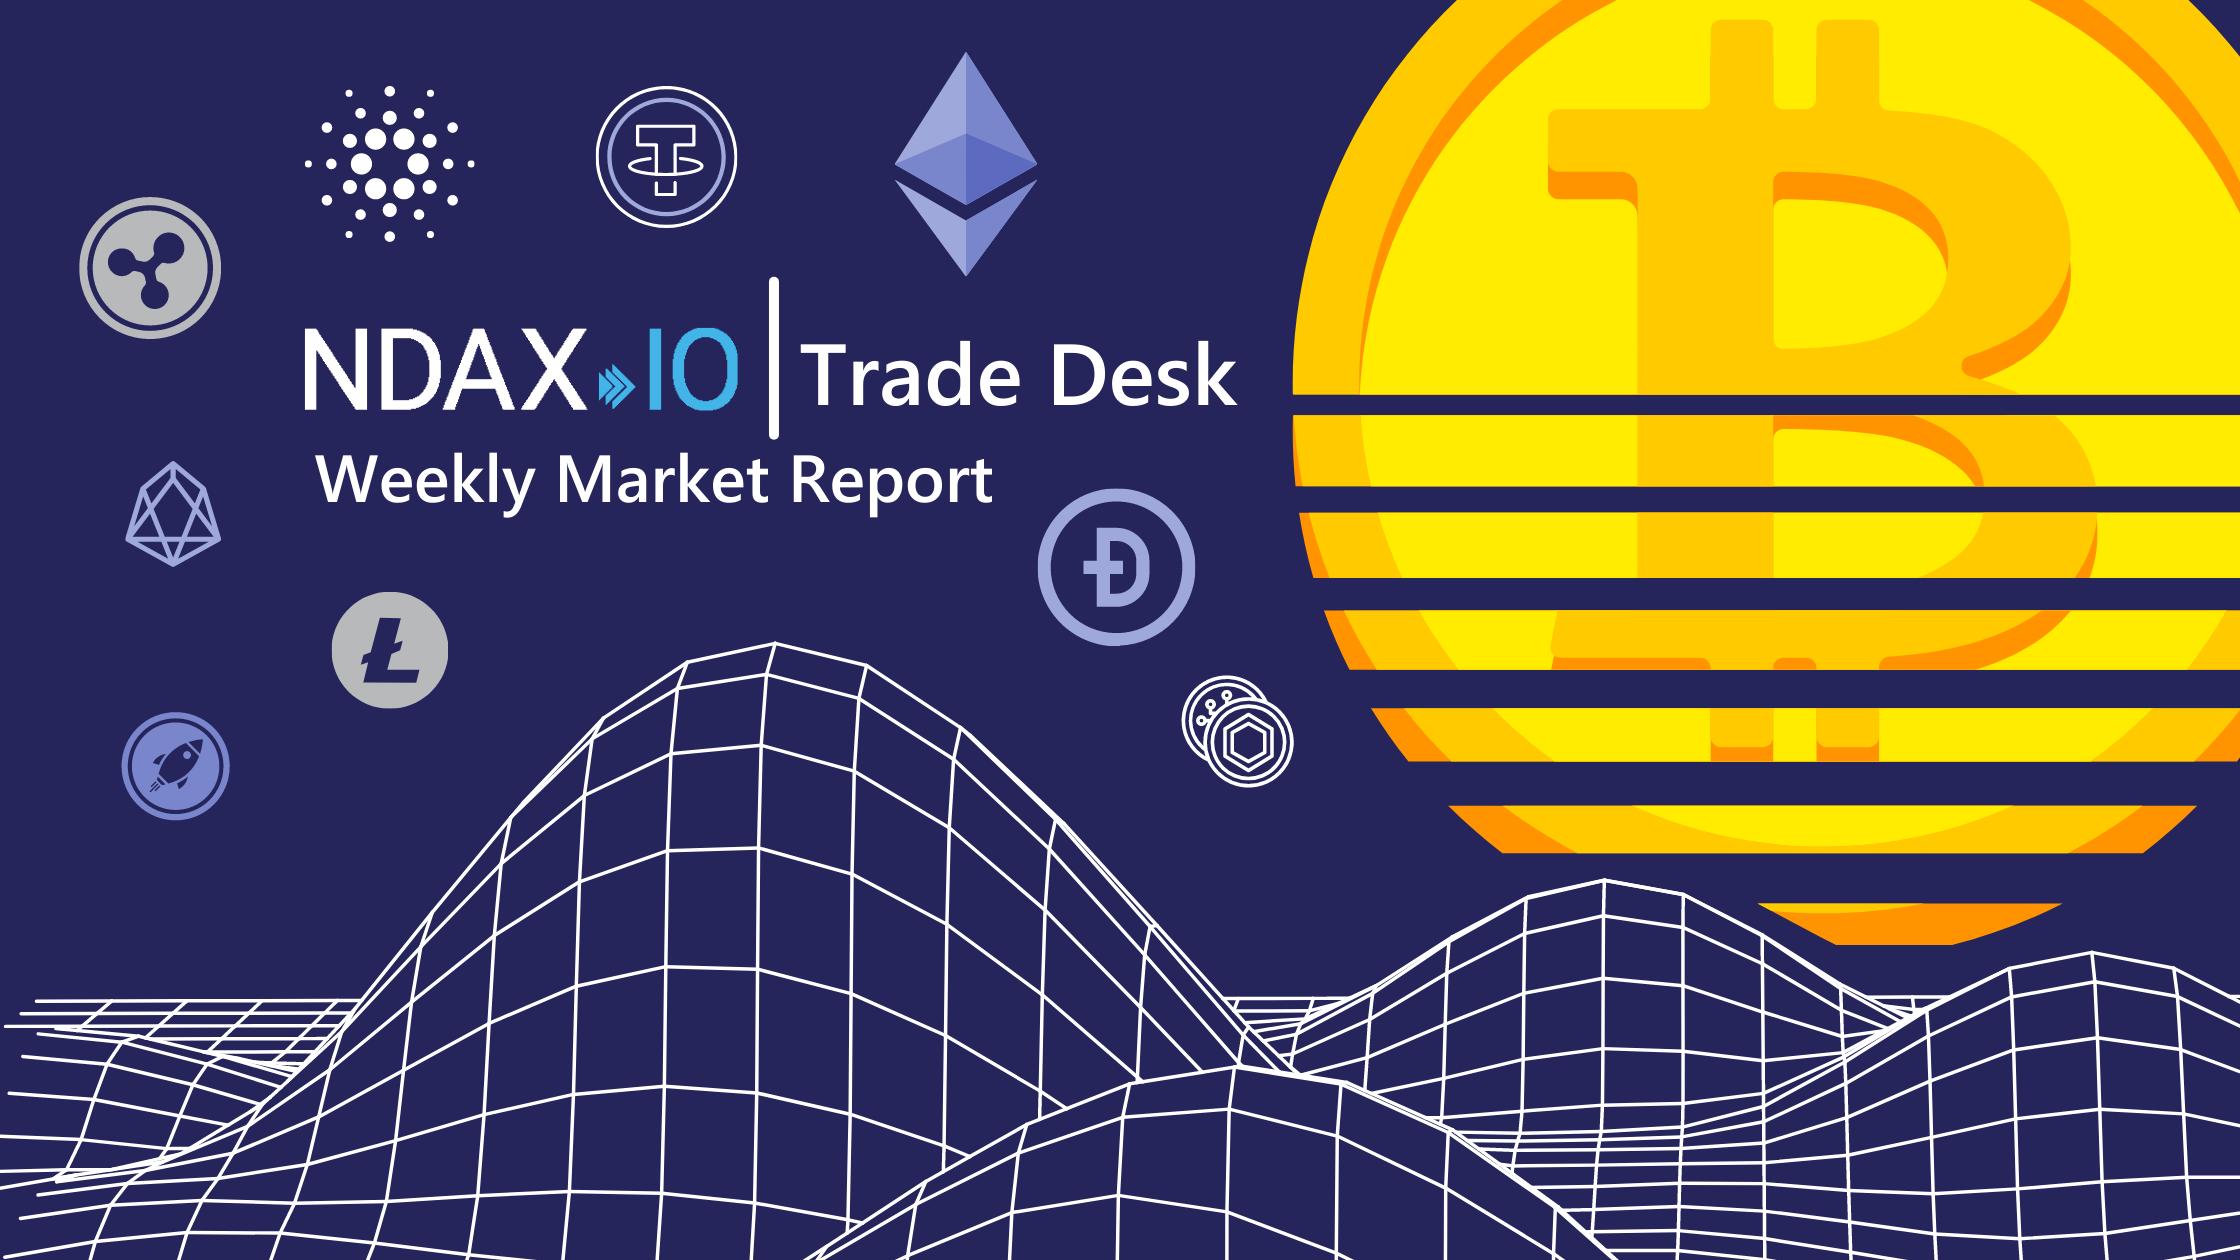 Weekly Market Report -September 20, 2021